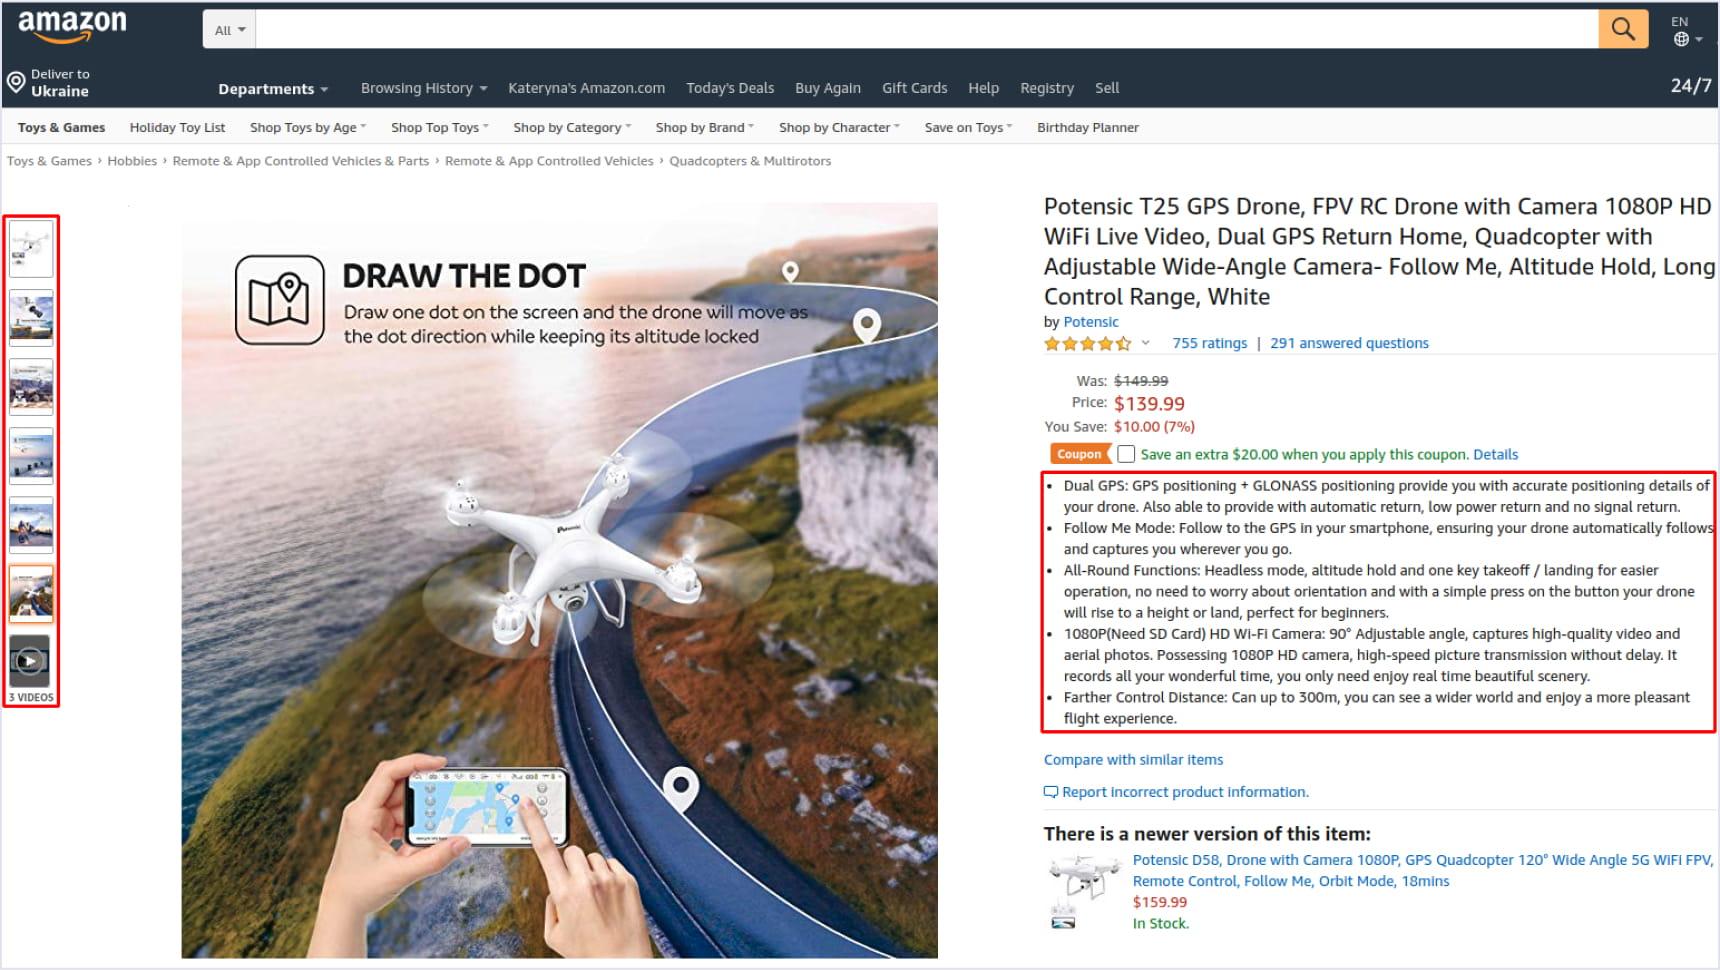 Amazon's user-friendly design